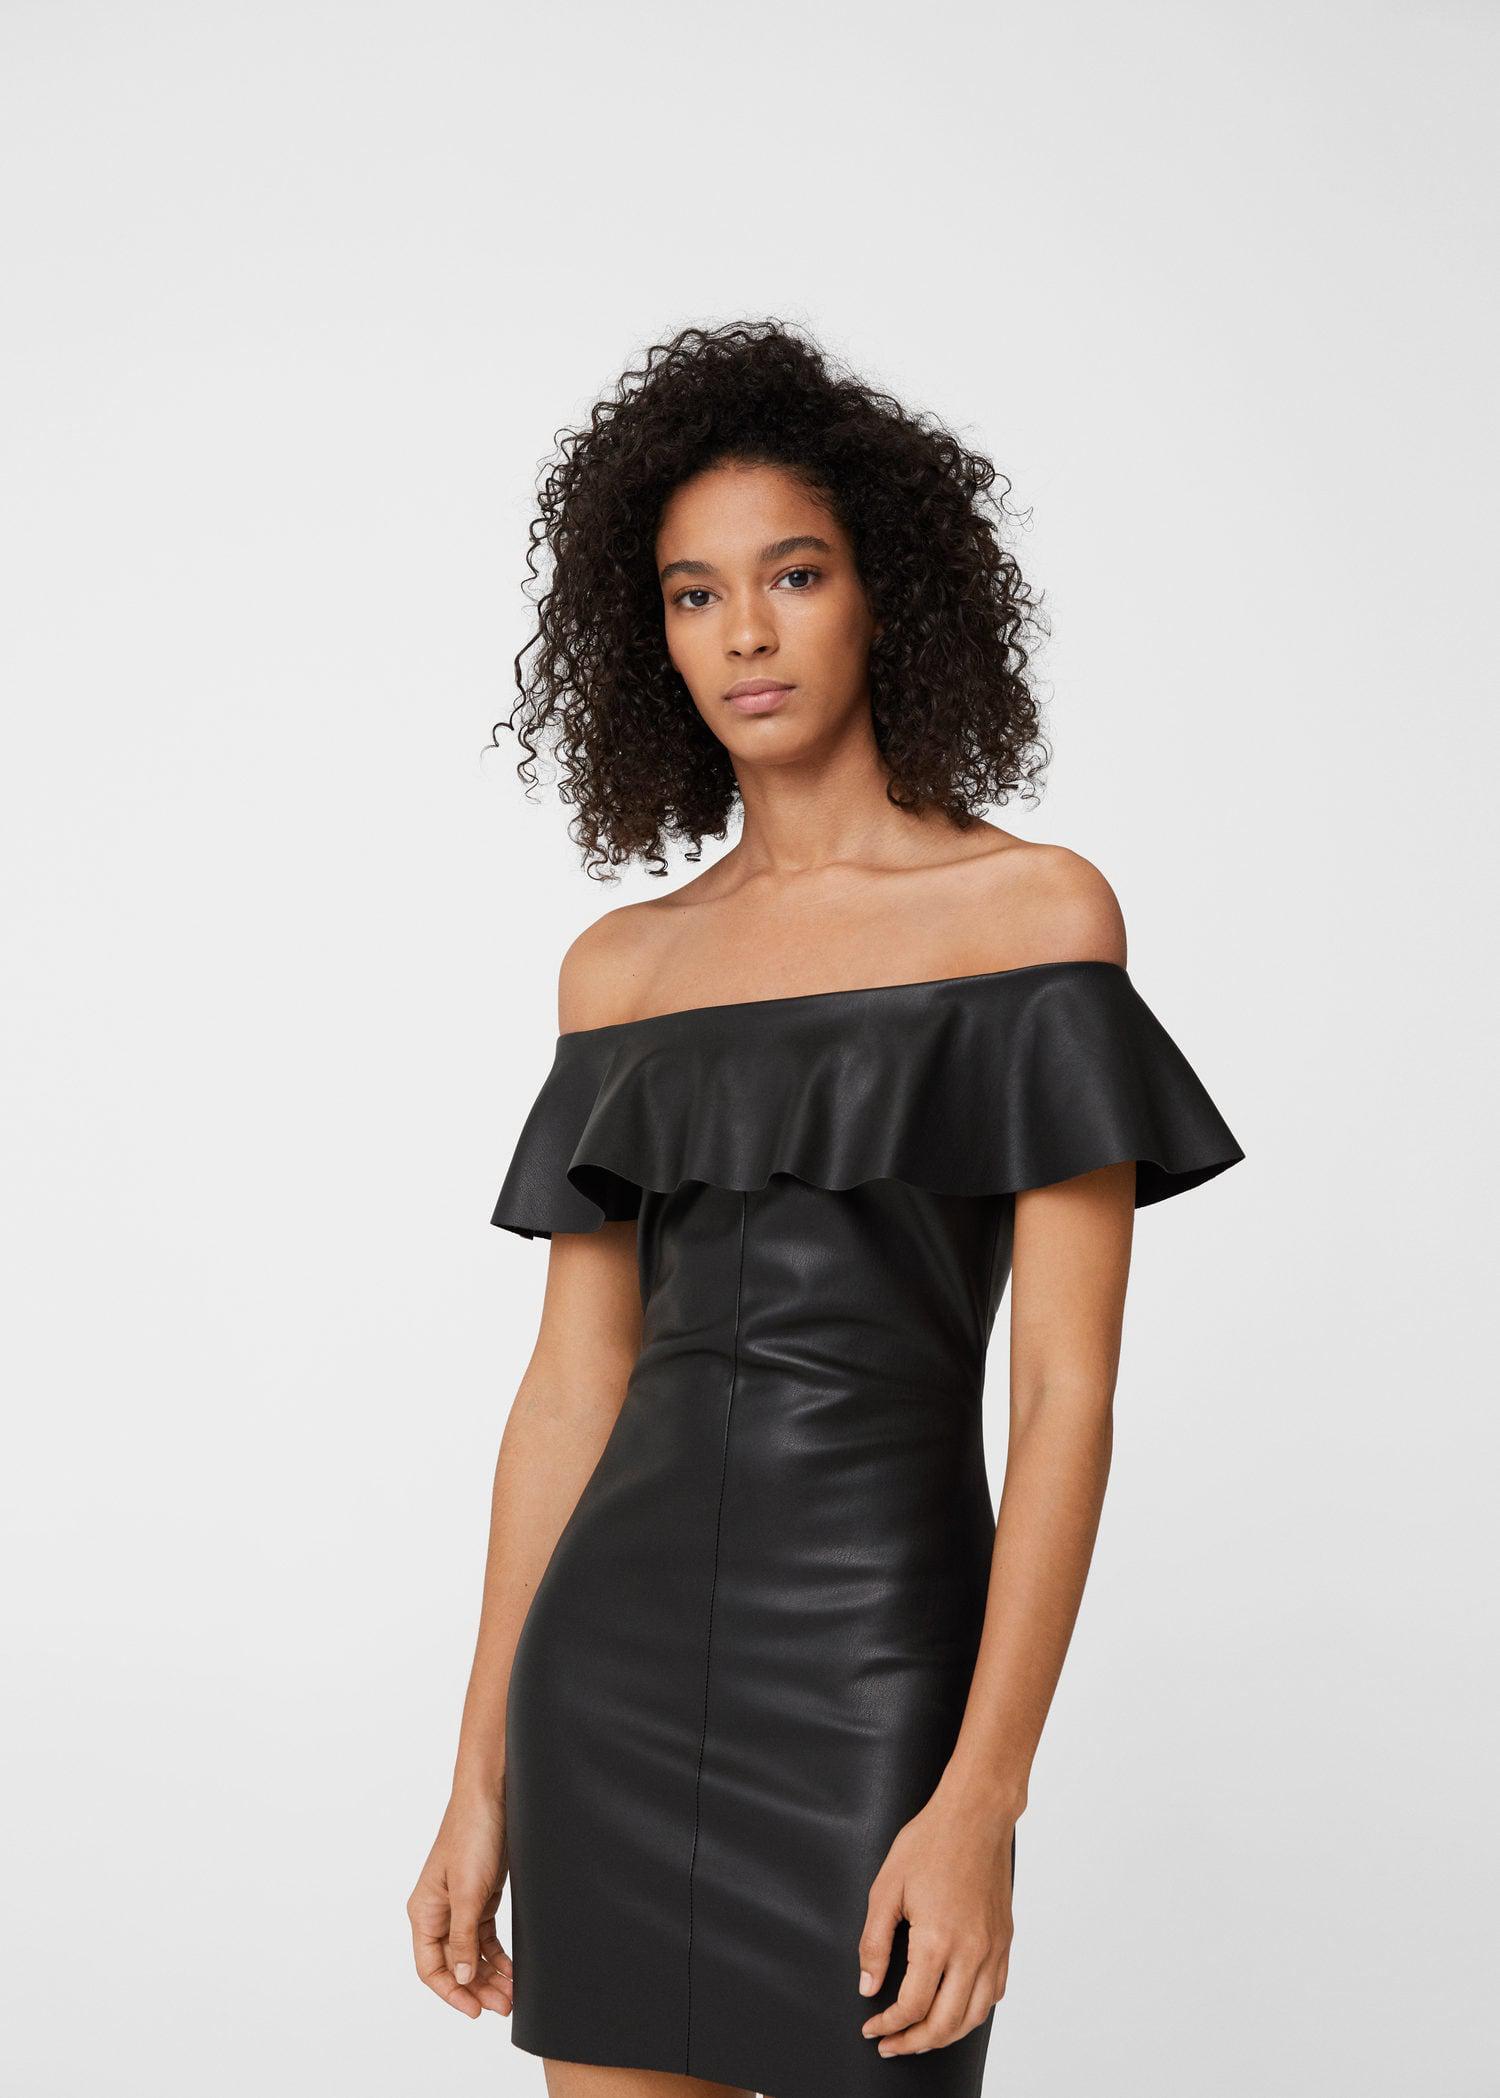 Coco mango cocktail dress